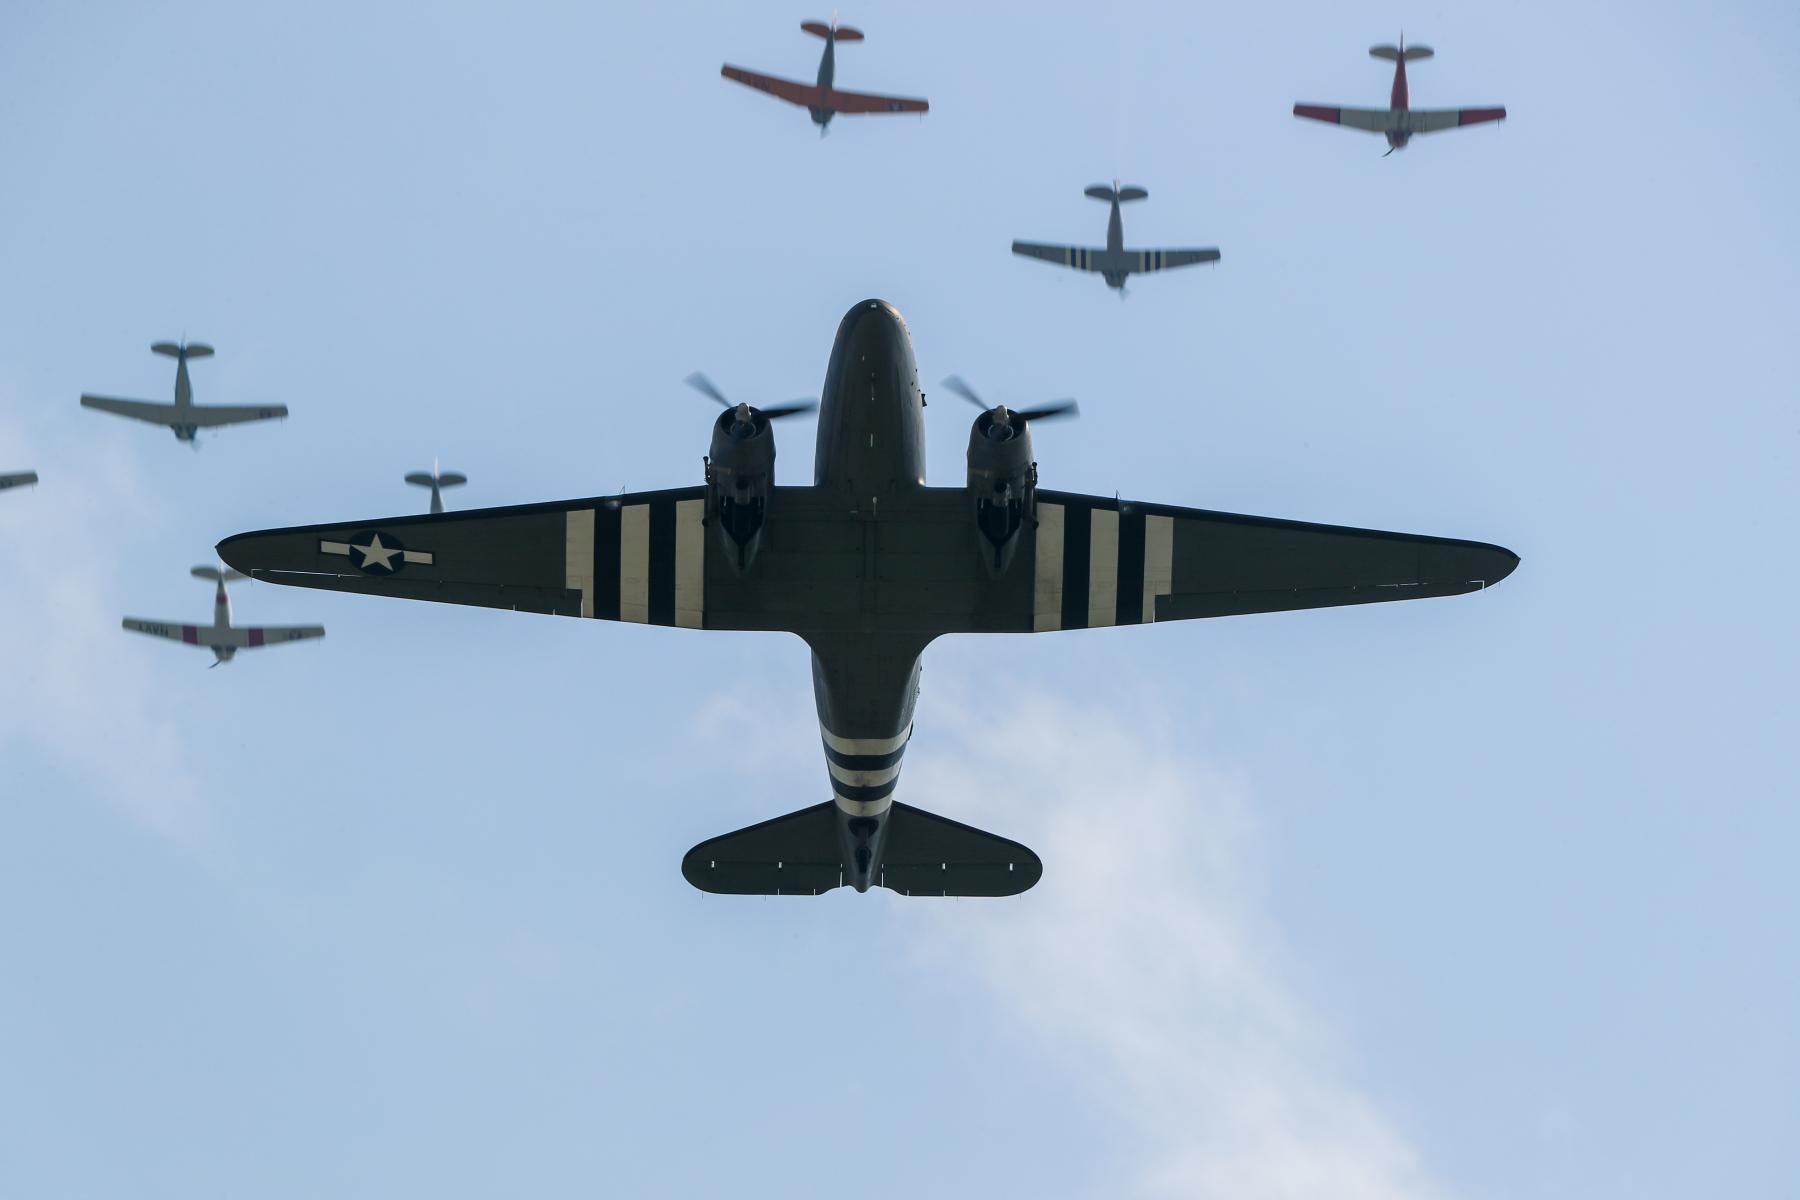 C-47 with Invasion Stripes by Art Eichmann